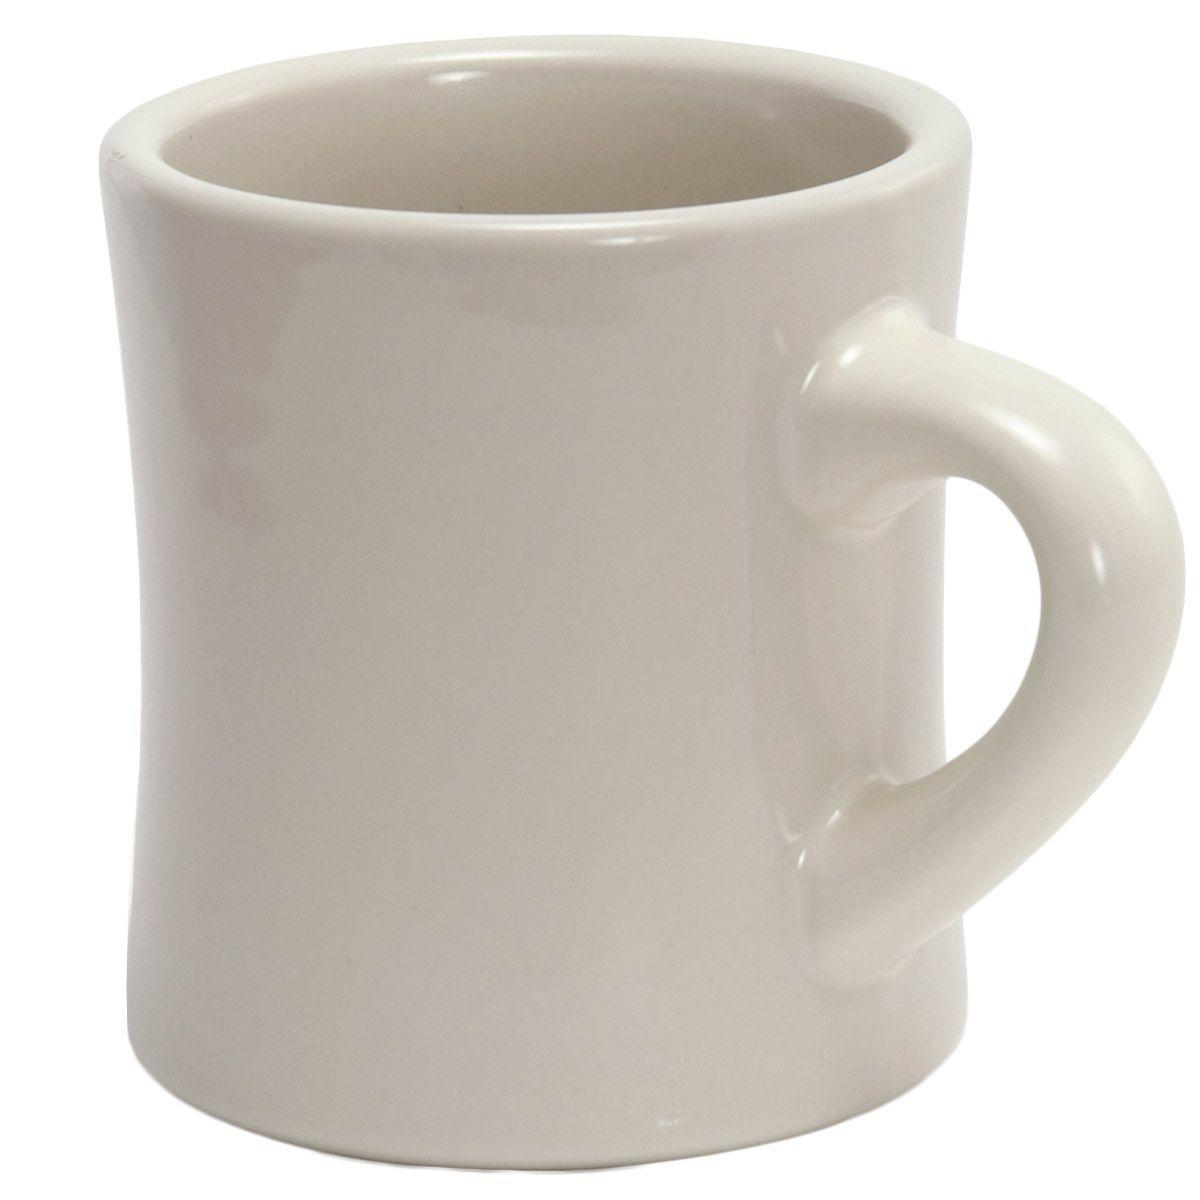 Heavy Mugs Duty Coffee Diner dChristmas List Wish Mug wnPX8k0O